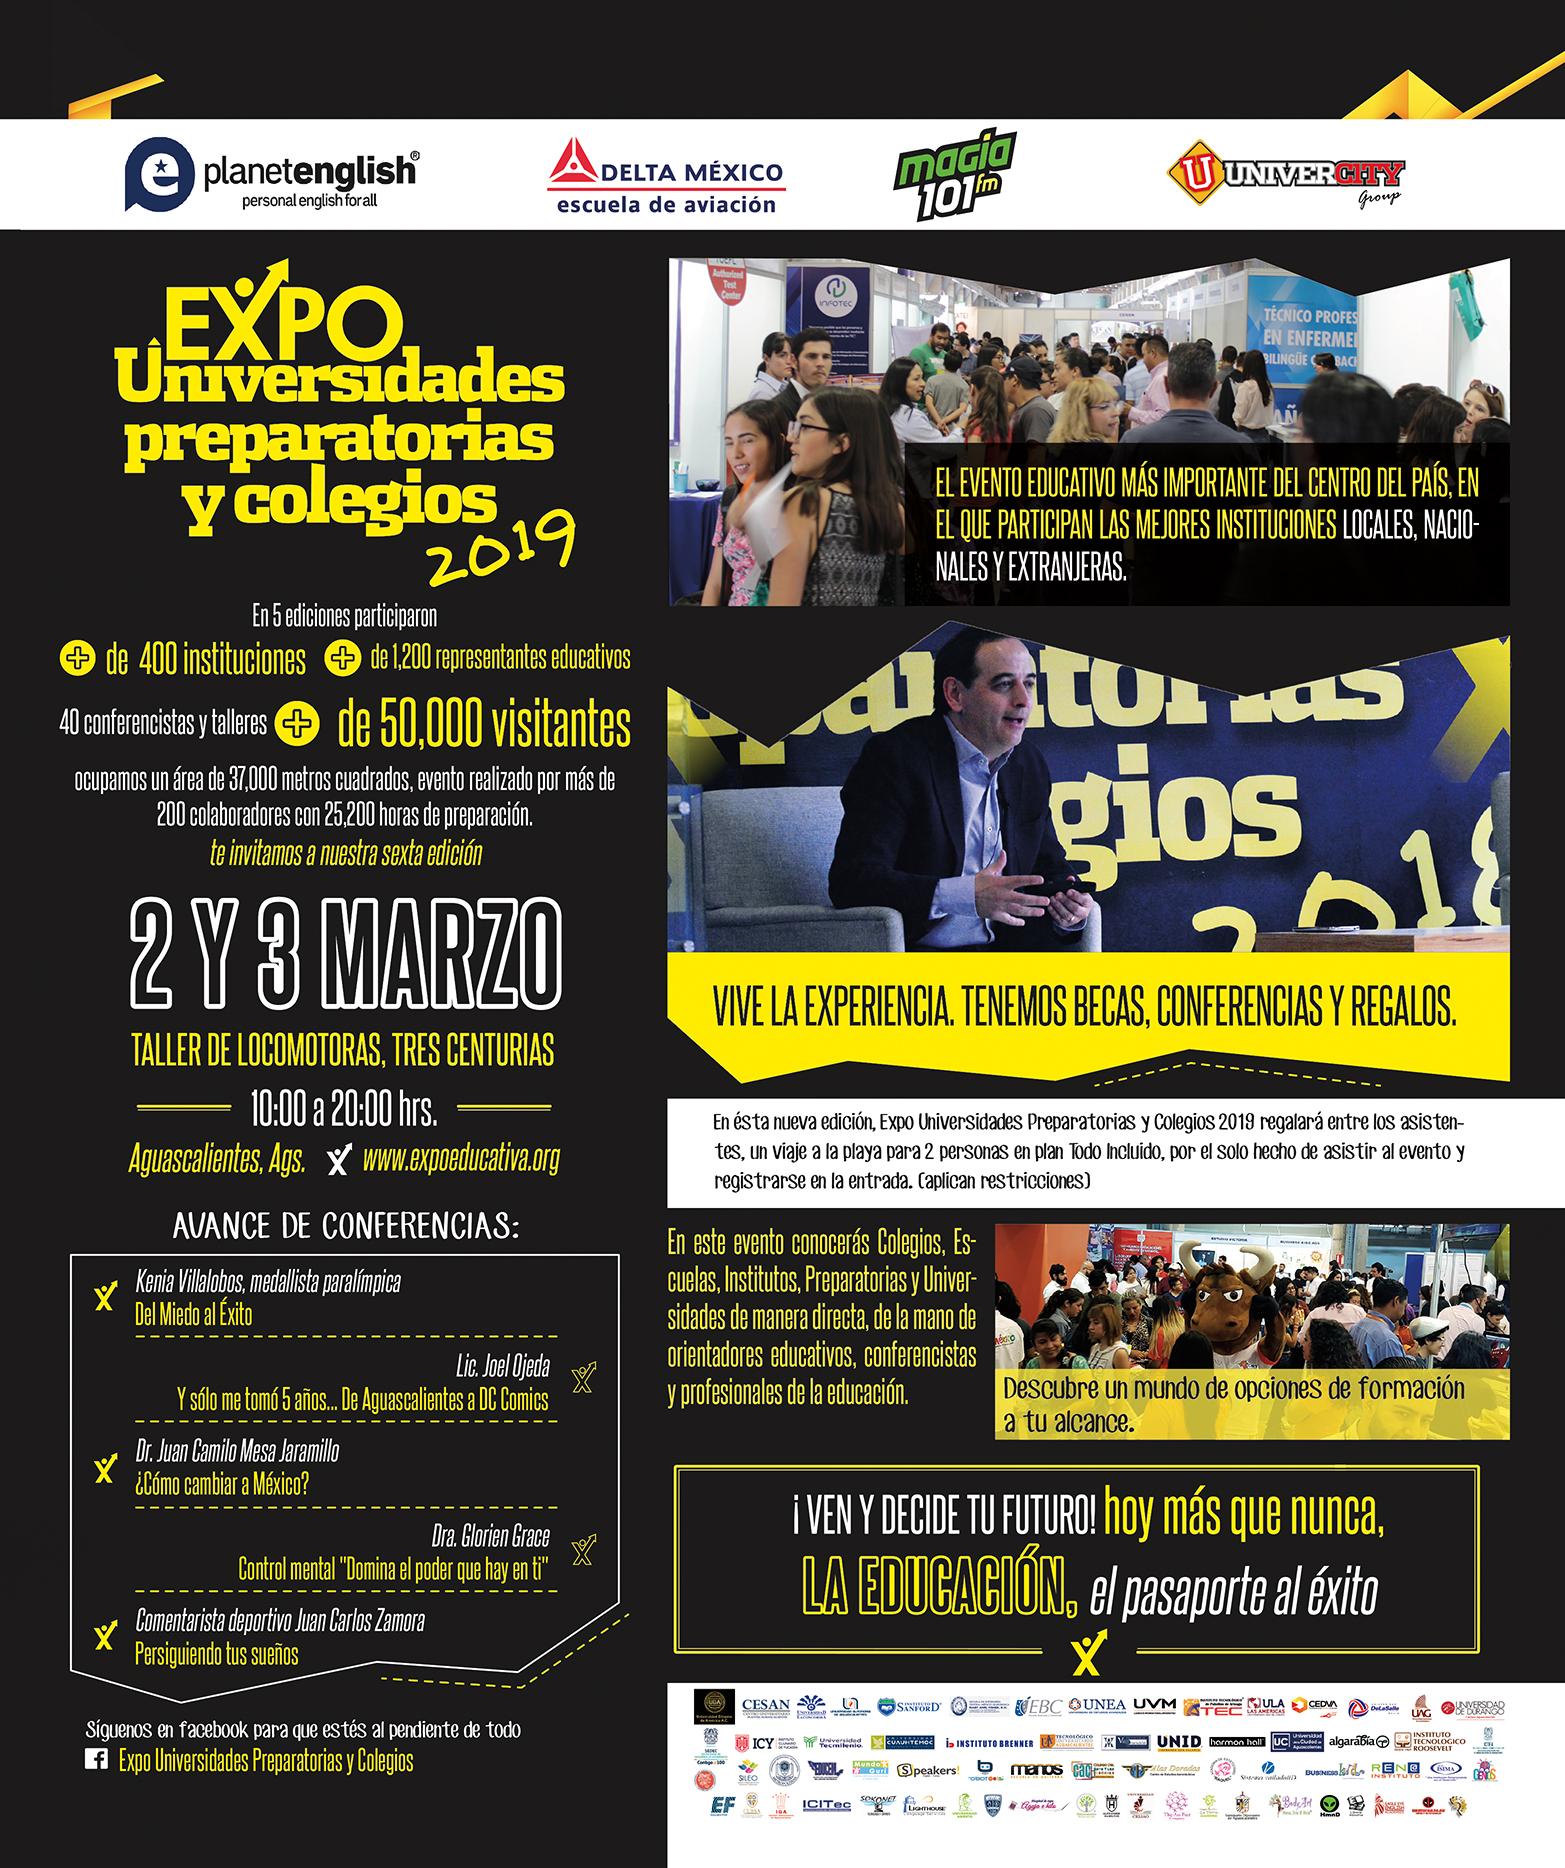 EXPO UNIVERSIDADES